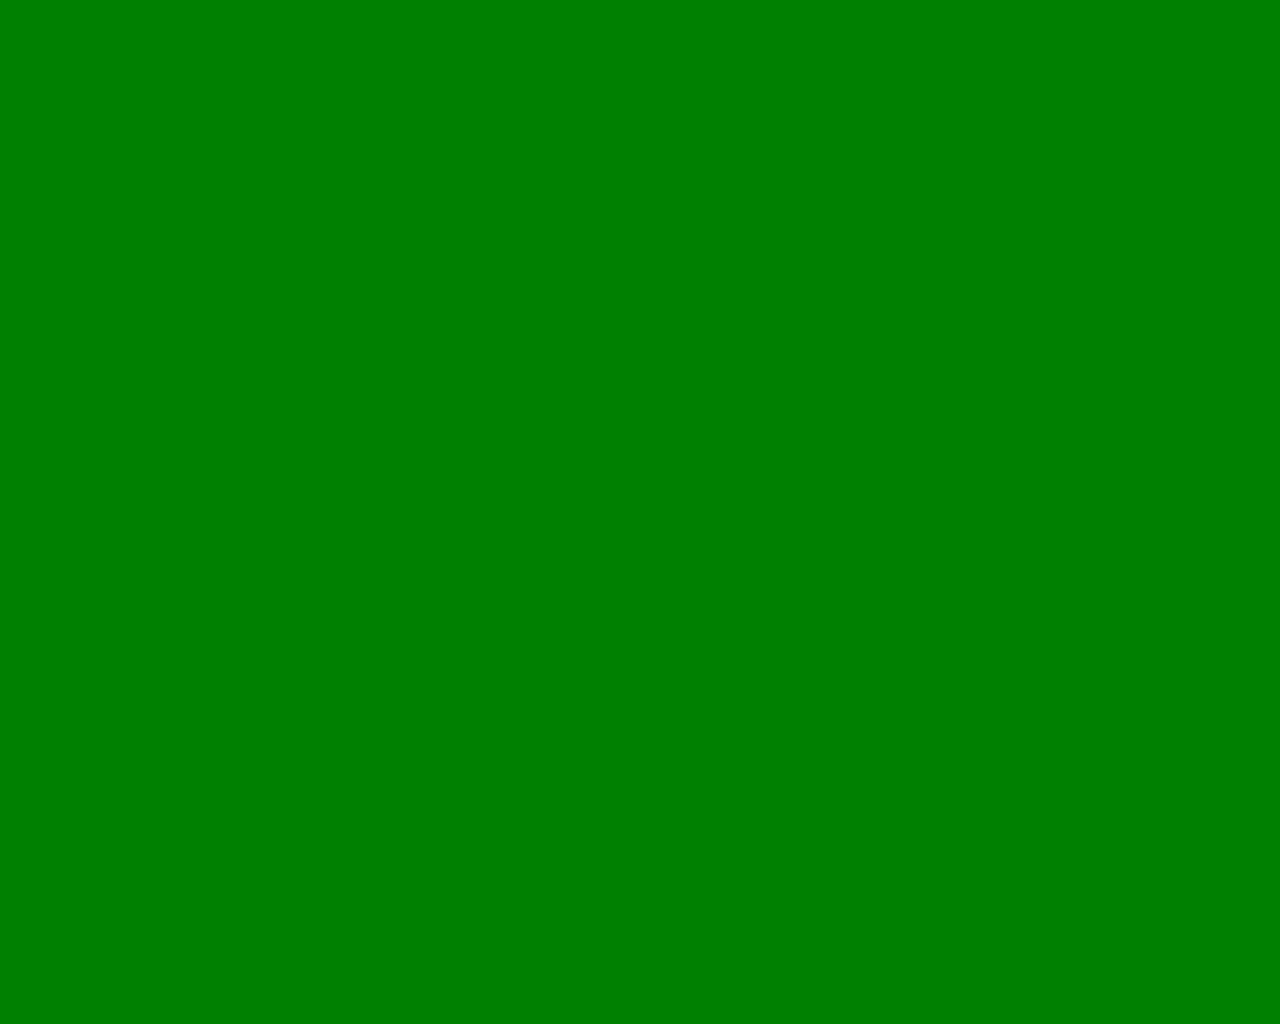 1280x1024 office green solid color background. Black Bedroom Furniture Sets. Home Design Ideas